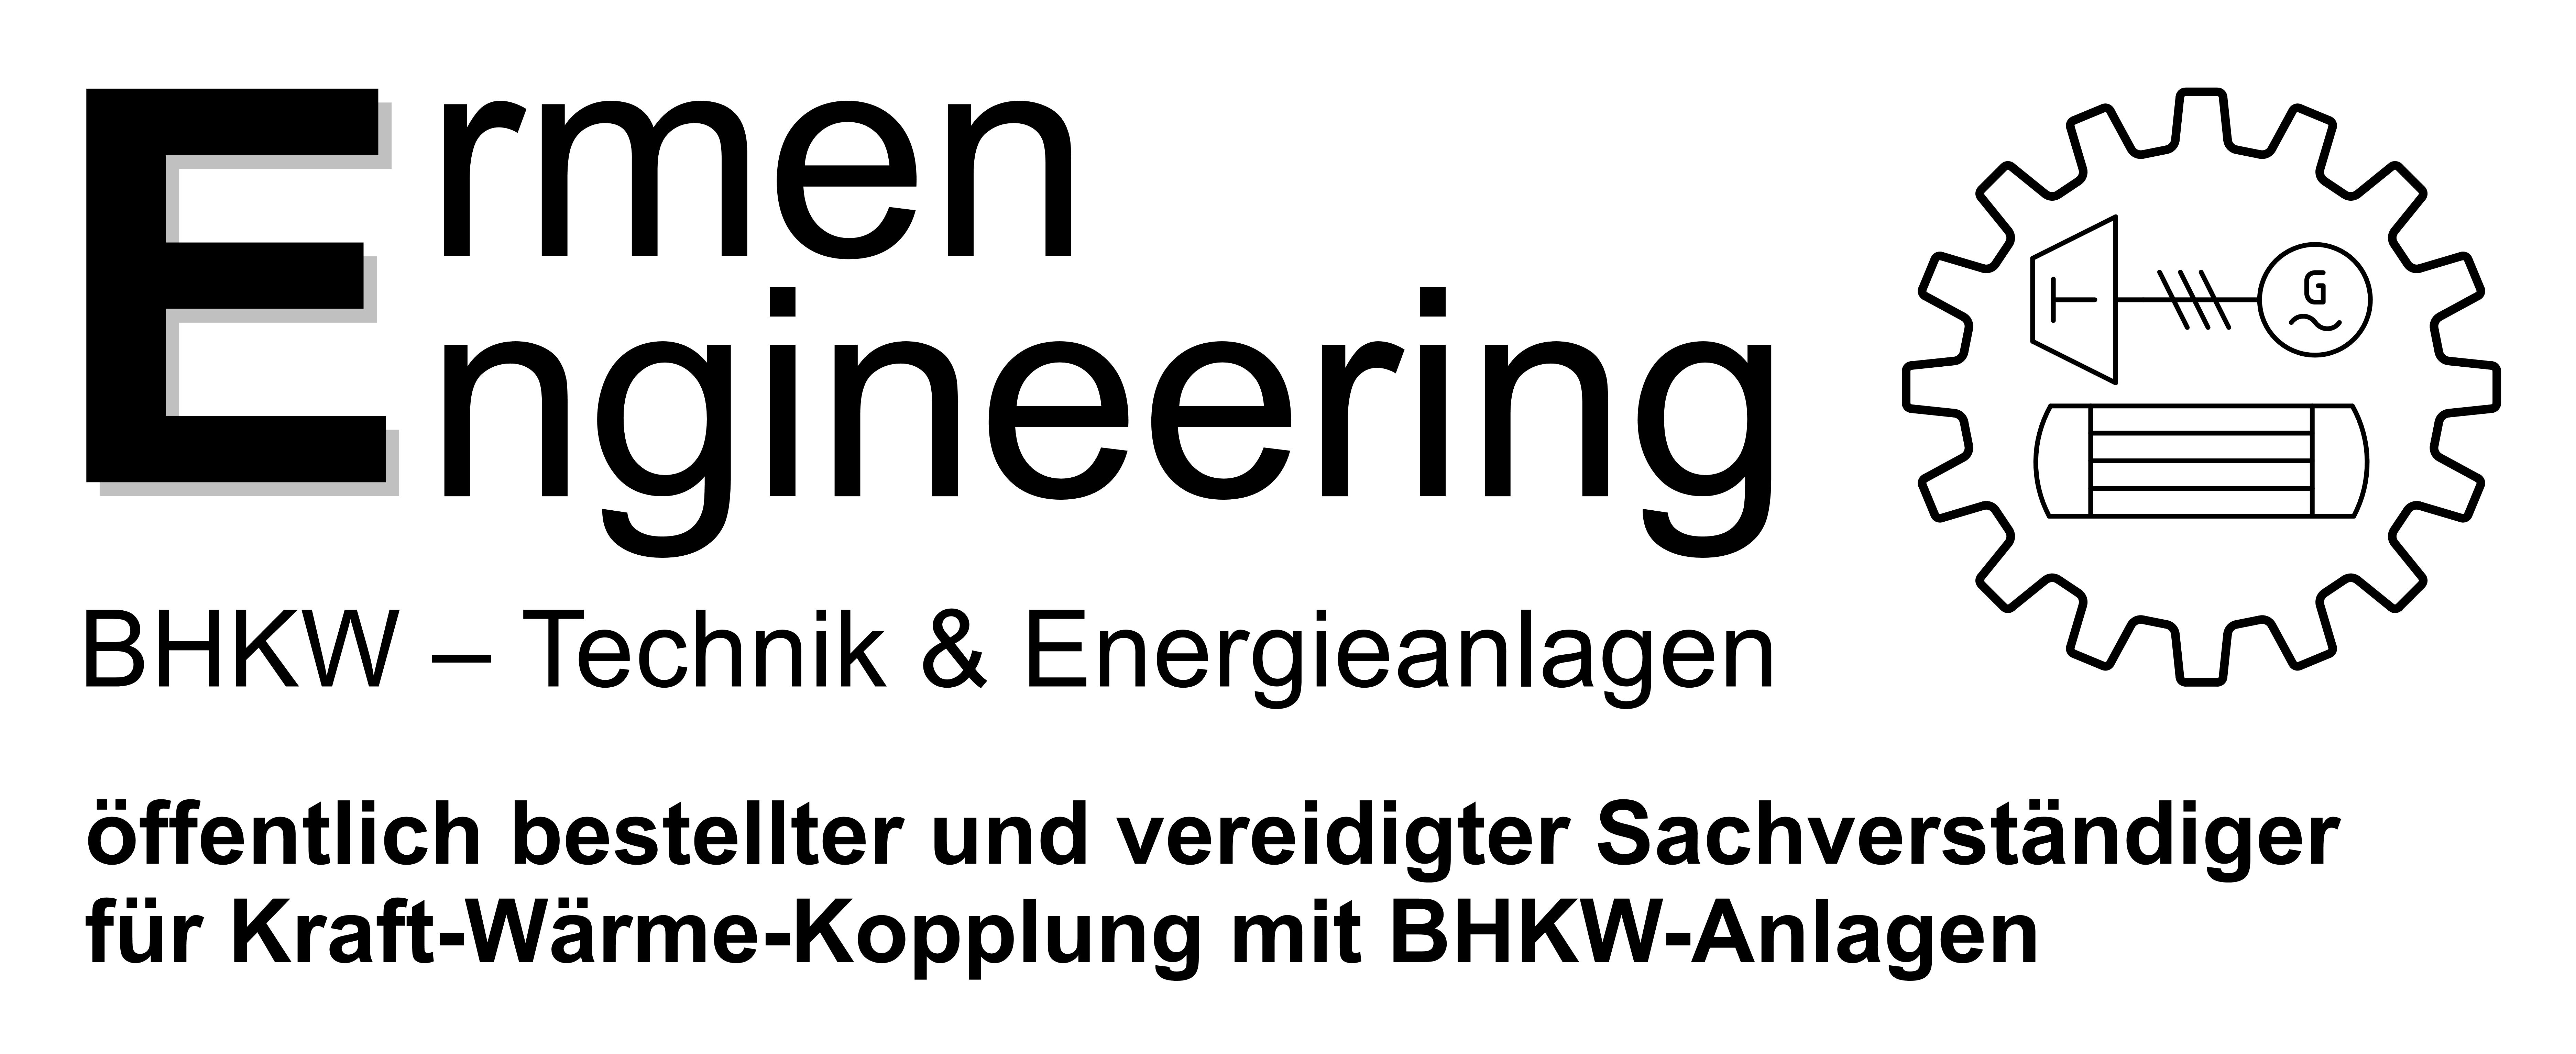 Ermen-Engineering